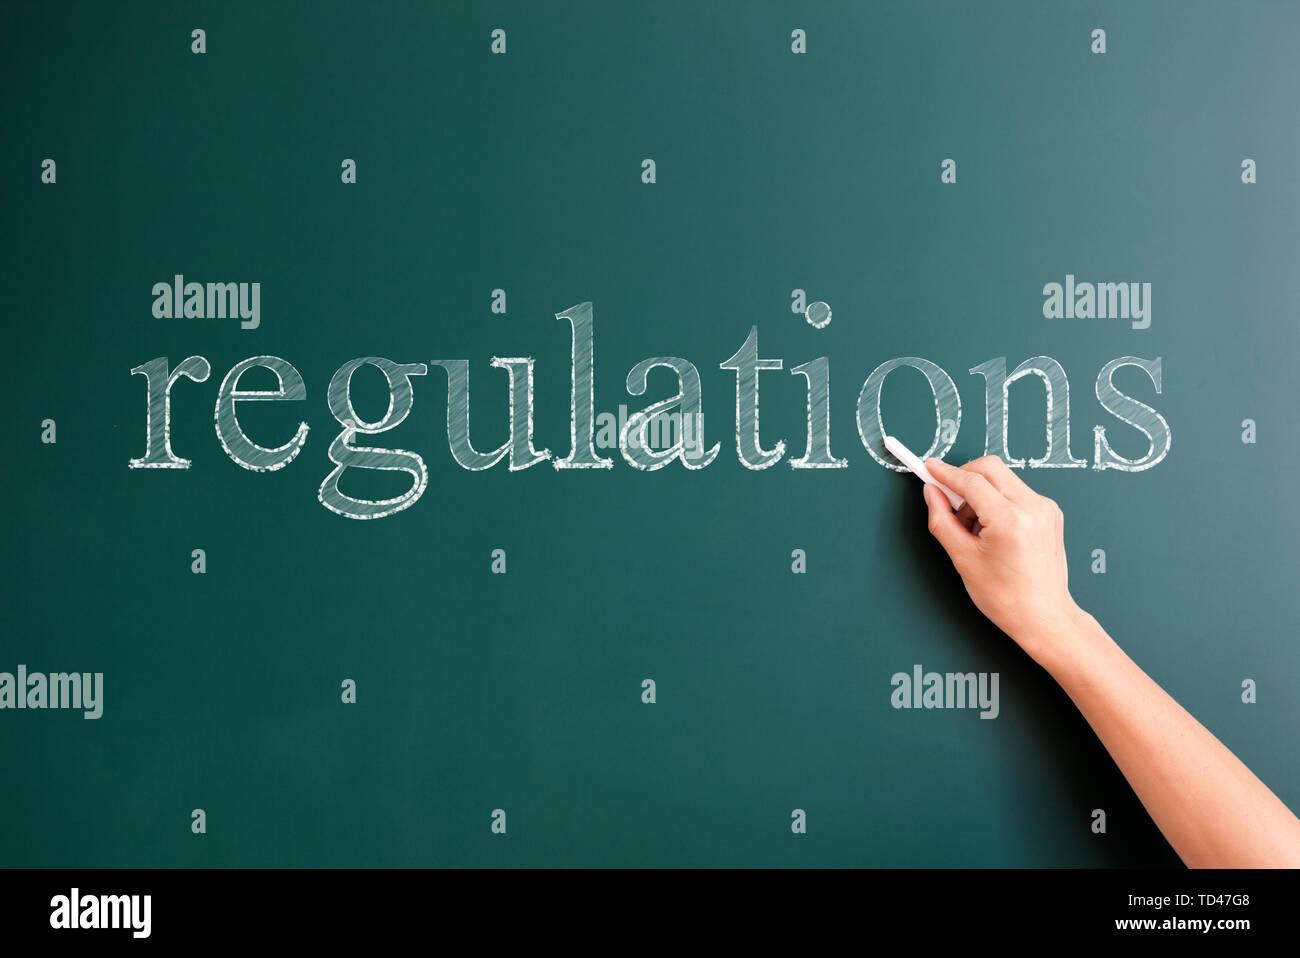 regulations written on blackboard - Stock Image